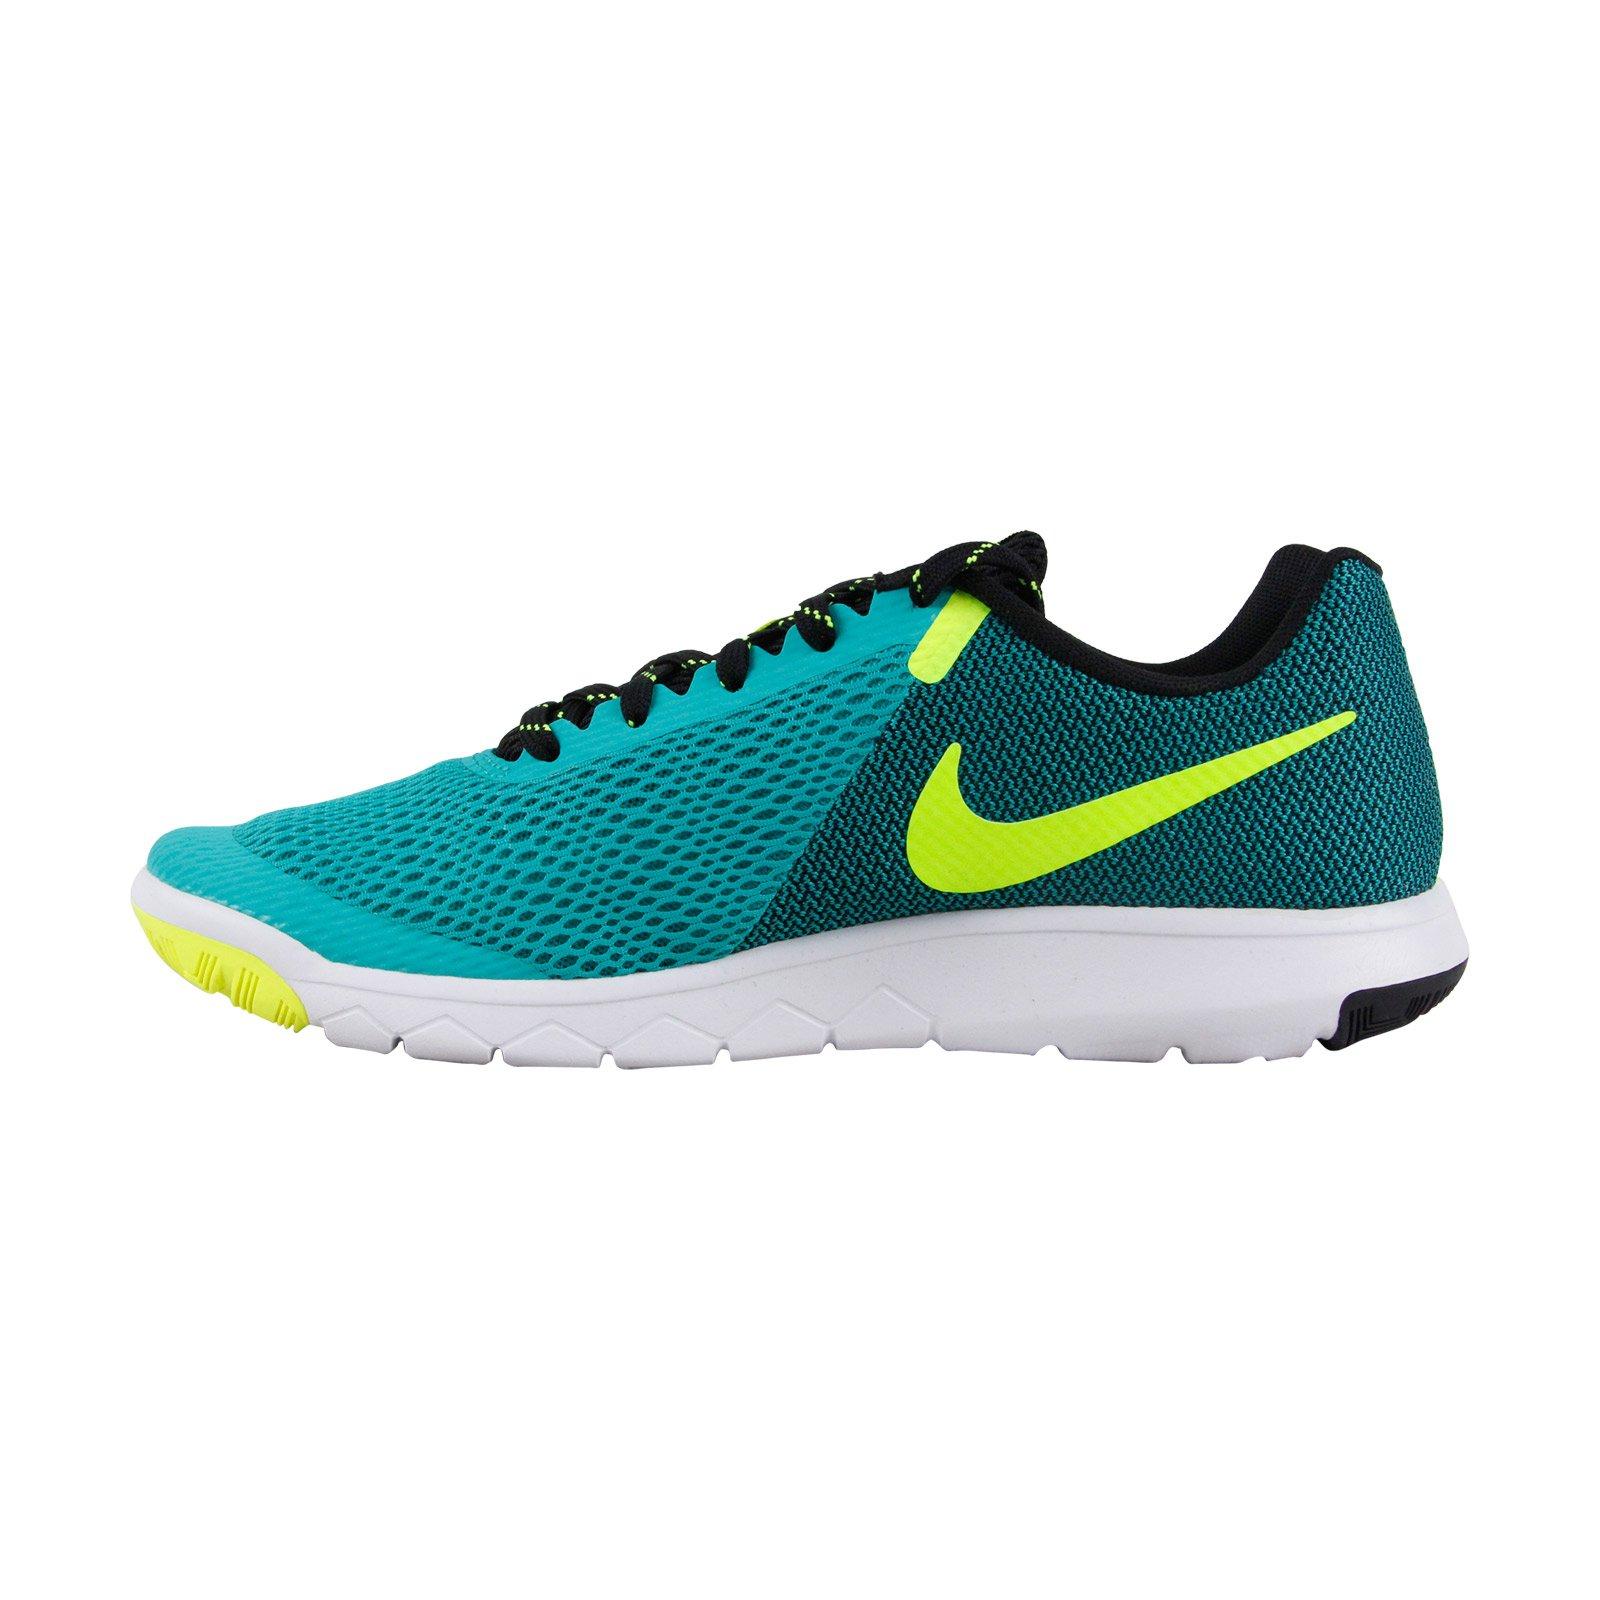 5b34d7d1df316 Galleon - Nike Women s Flex Experience Rn 5 Running Shoe Clear  Jade Volt-black-white 5 (B) M US